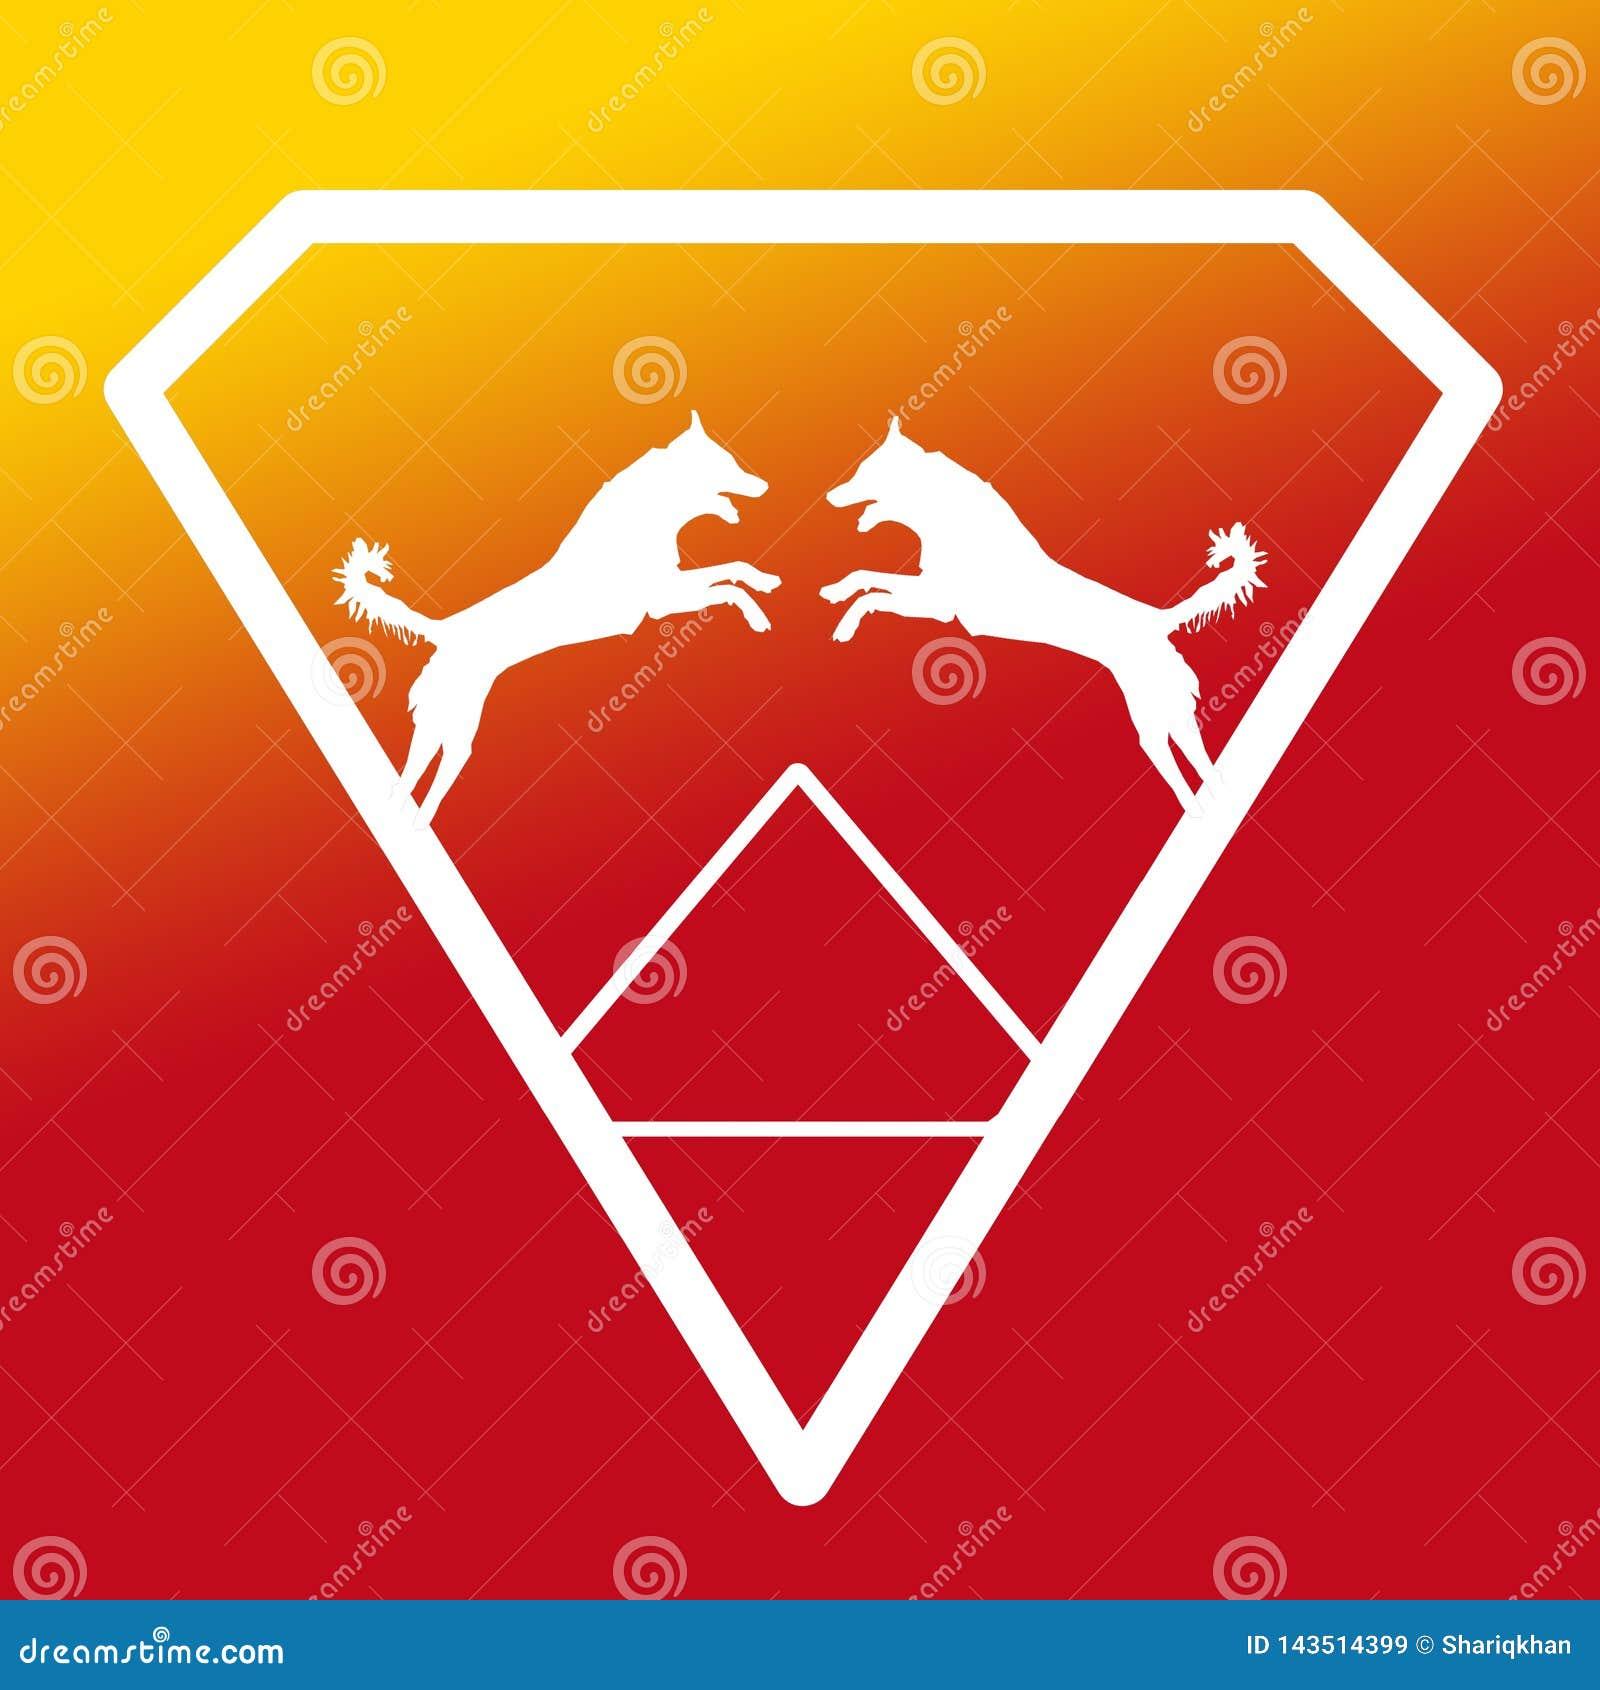 Pares de Logo Banner Image Jumping Dog en Diamond Shape en fondo amarillo-naranja